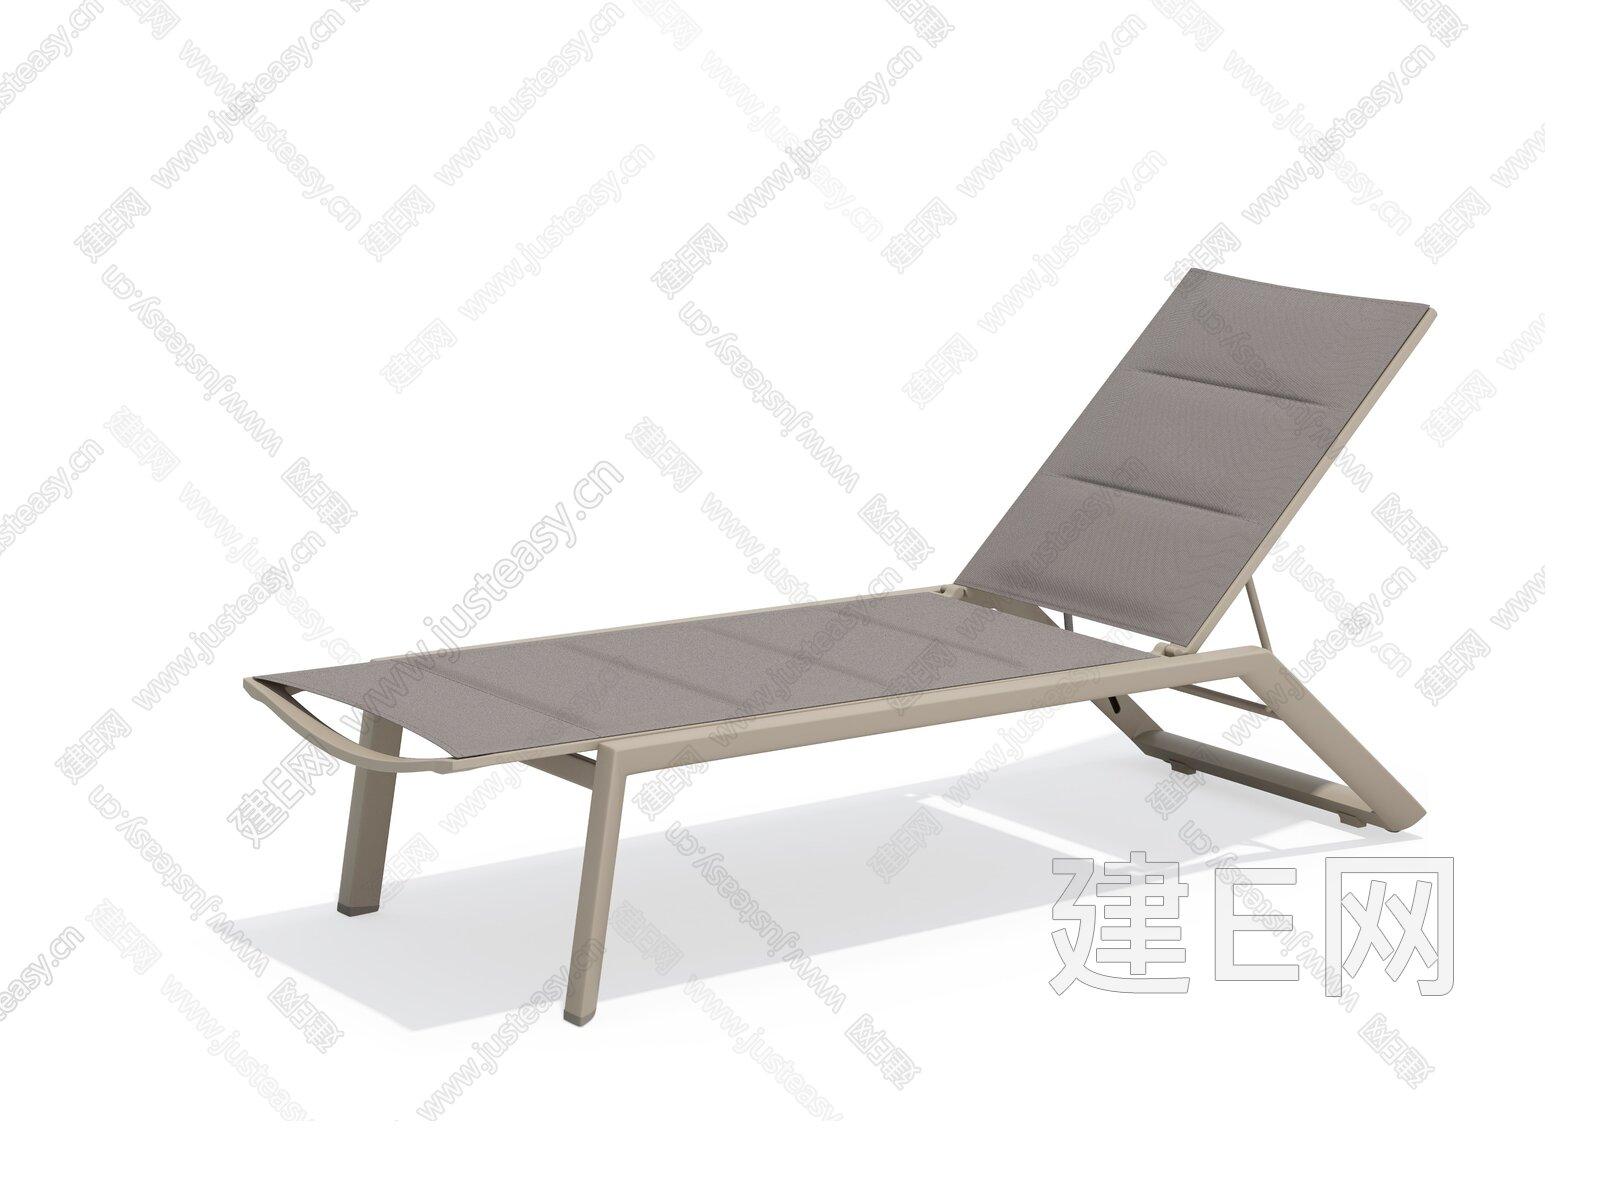 sunair 诗乐尔 现代户外躺椅3d模型